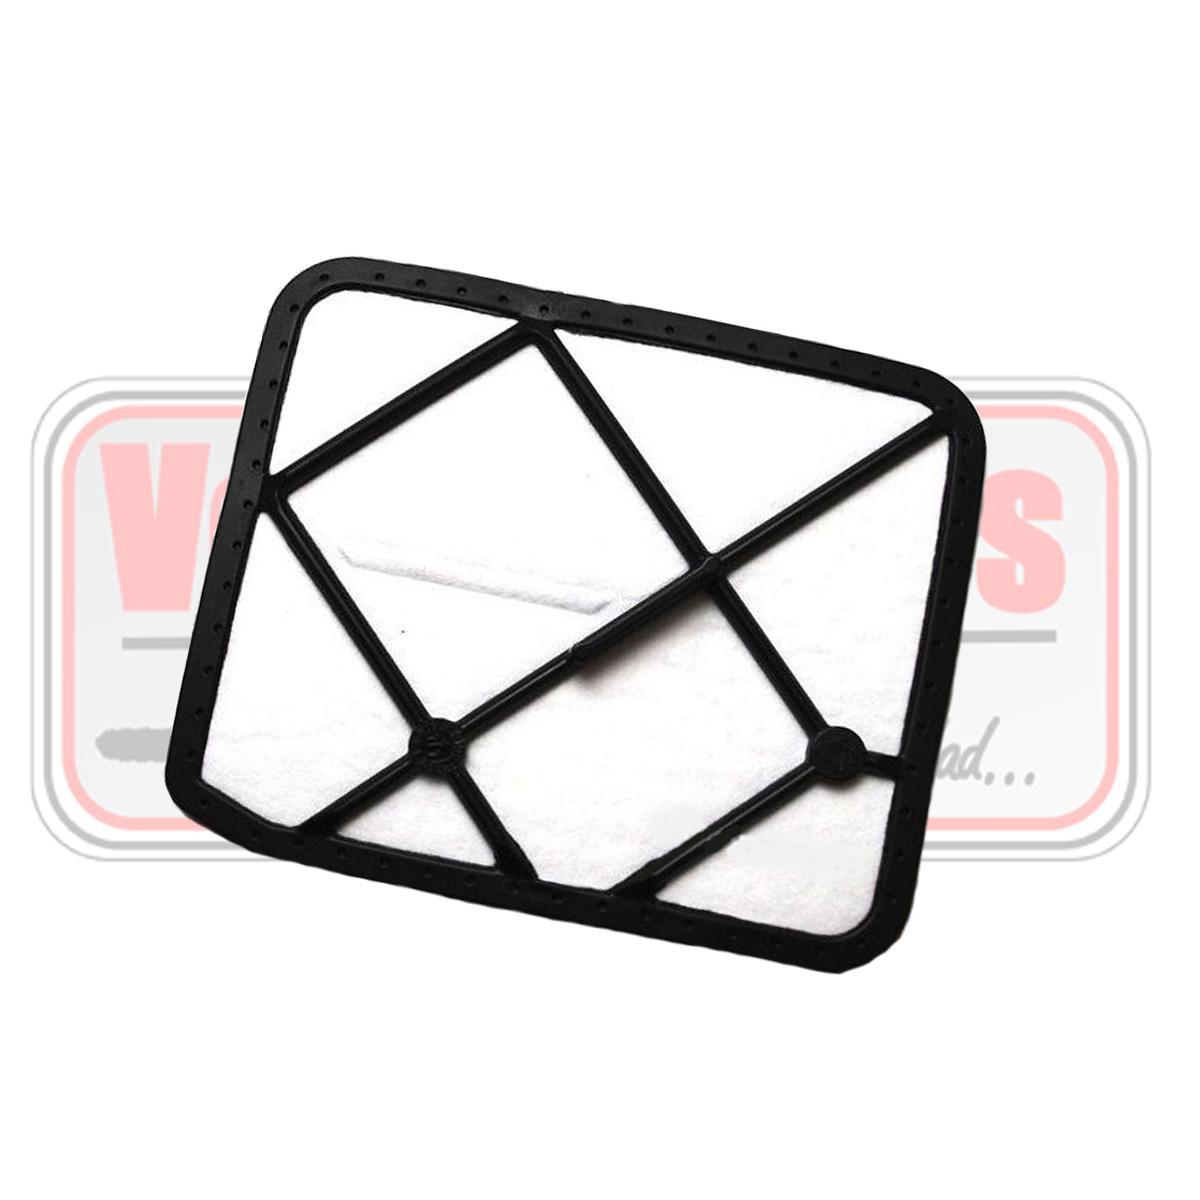 Filtro de aire Oleo Mac SPARTA 37 / 370 / 38 / 380 / 42 / 44 /440